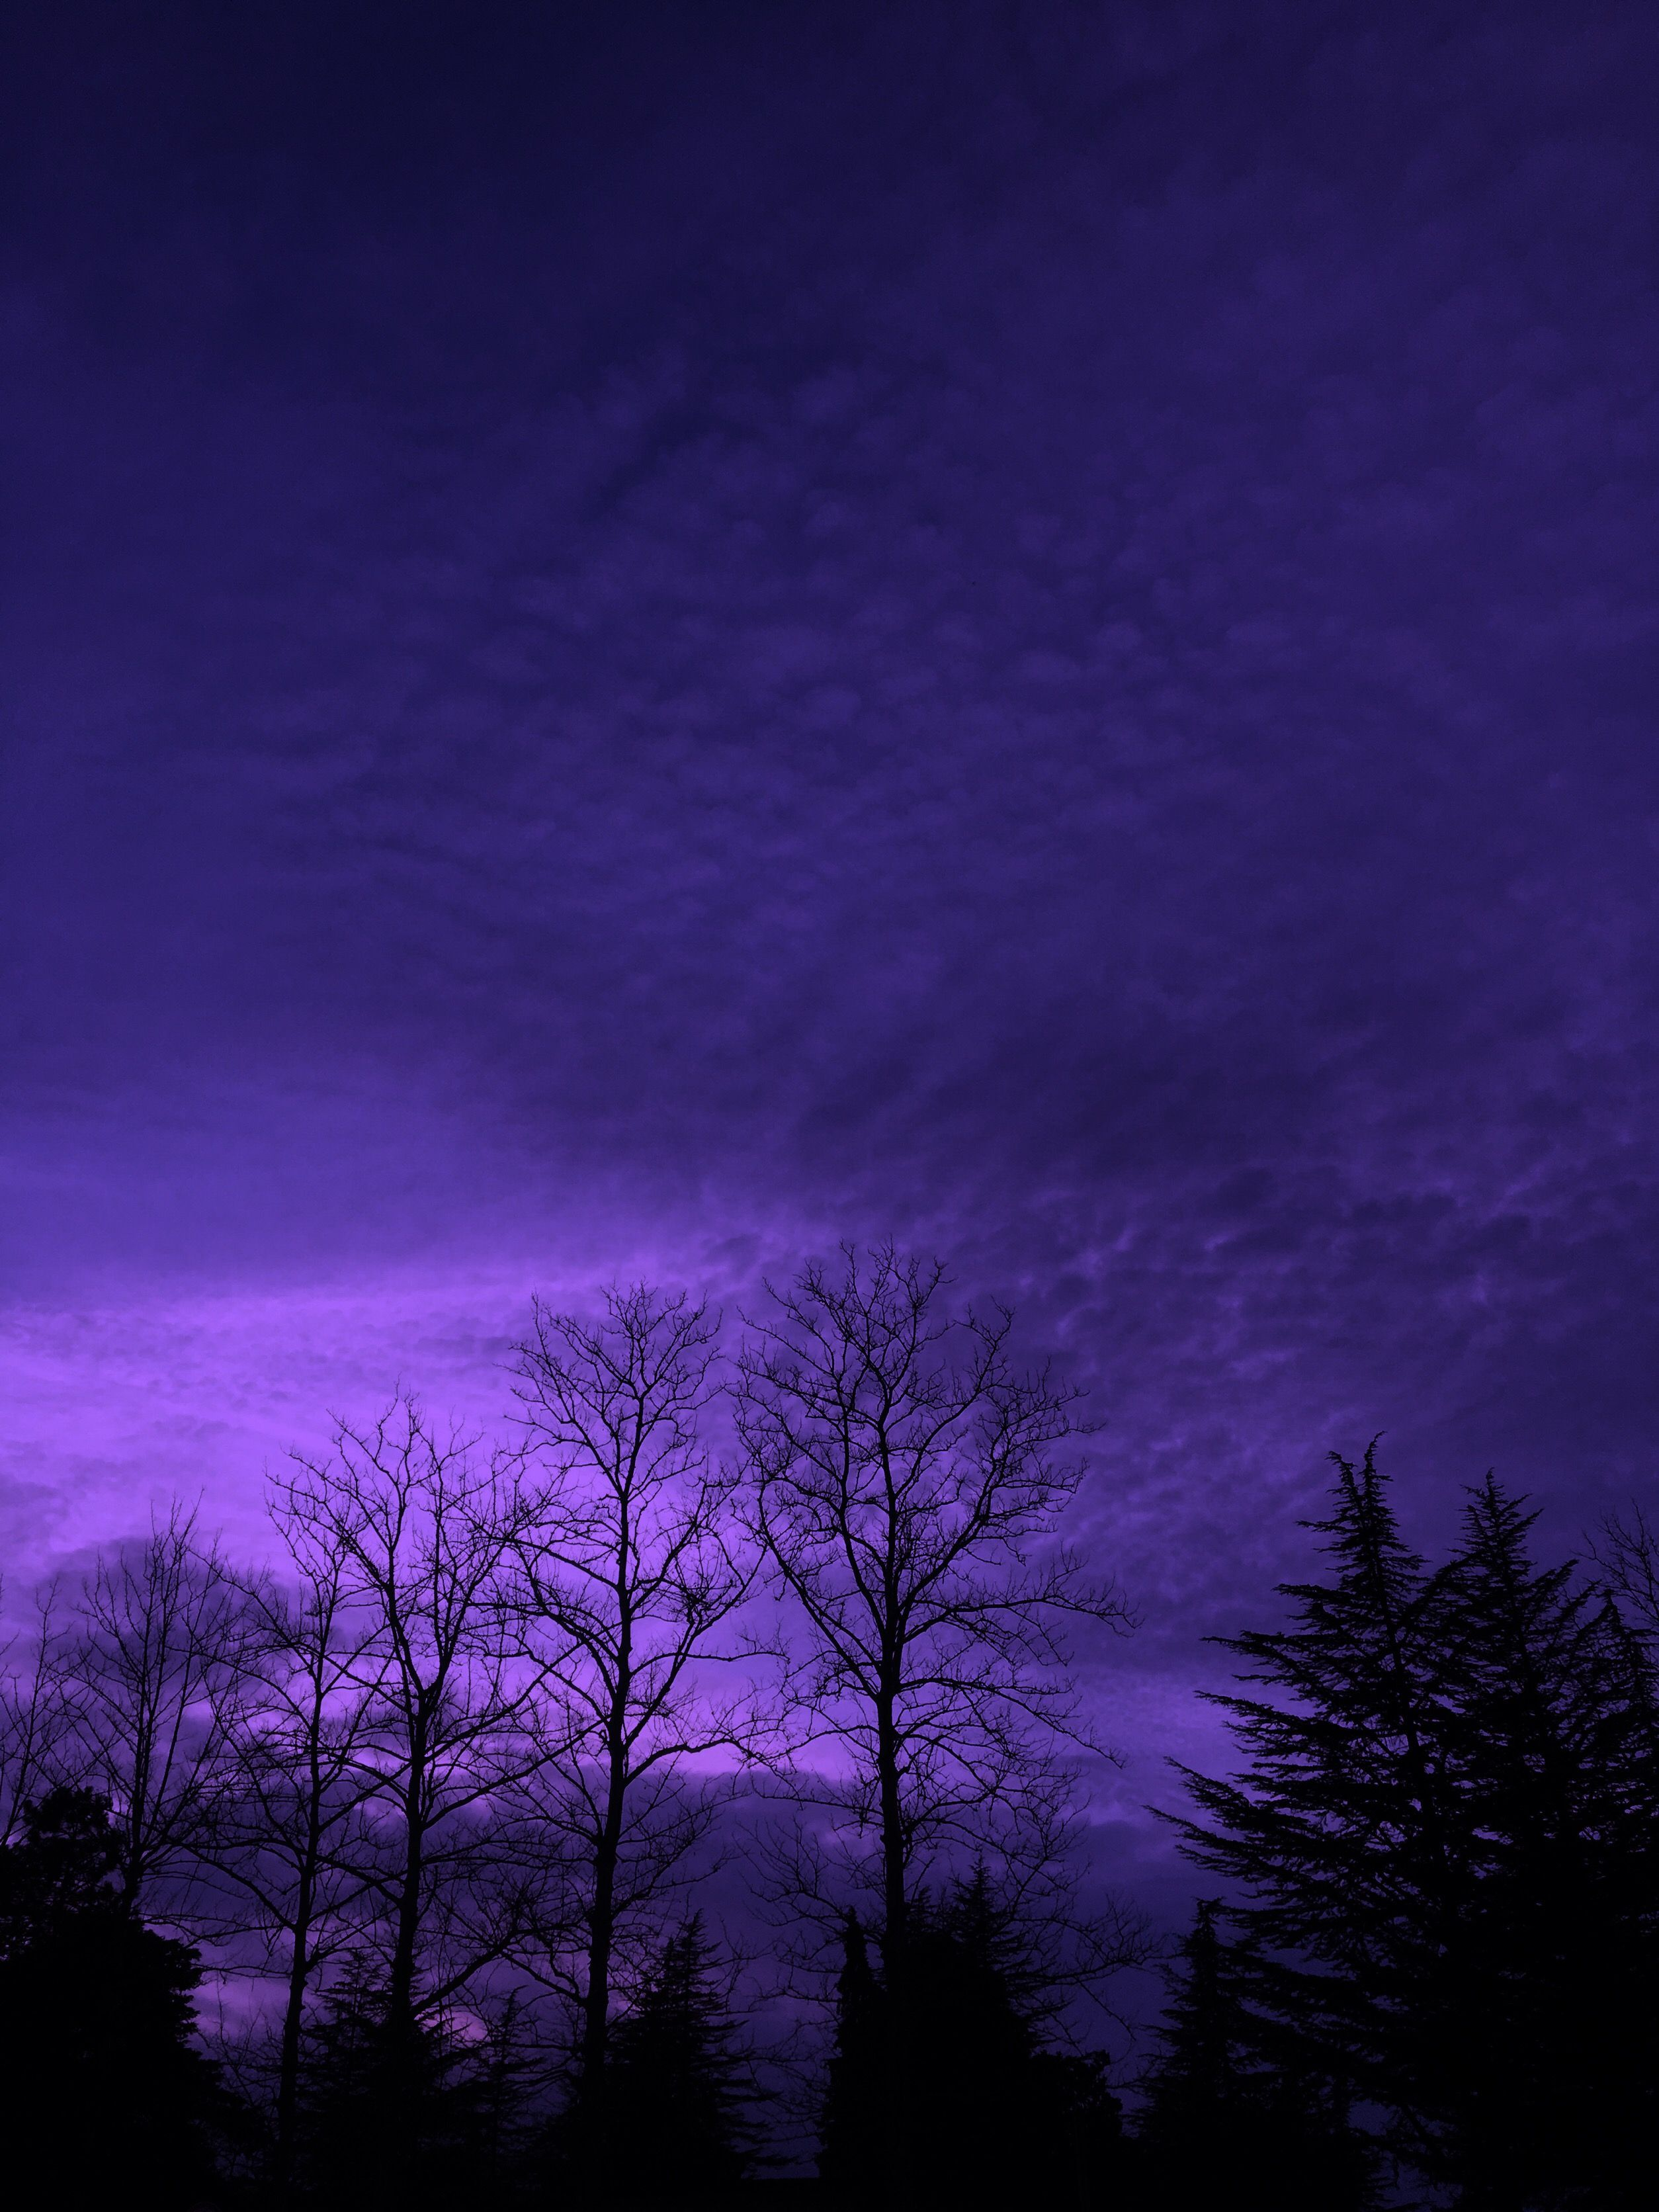 purple aesthetic landscape wallpapers